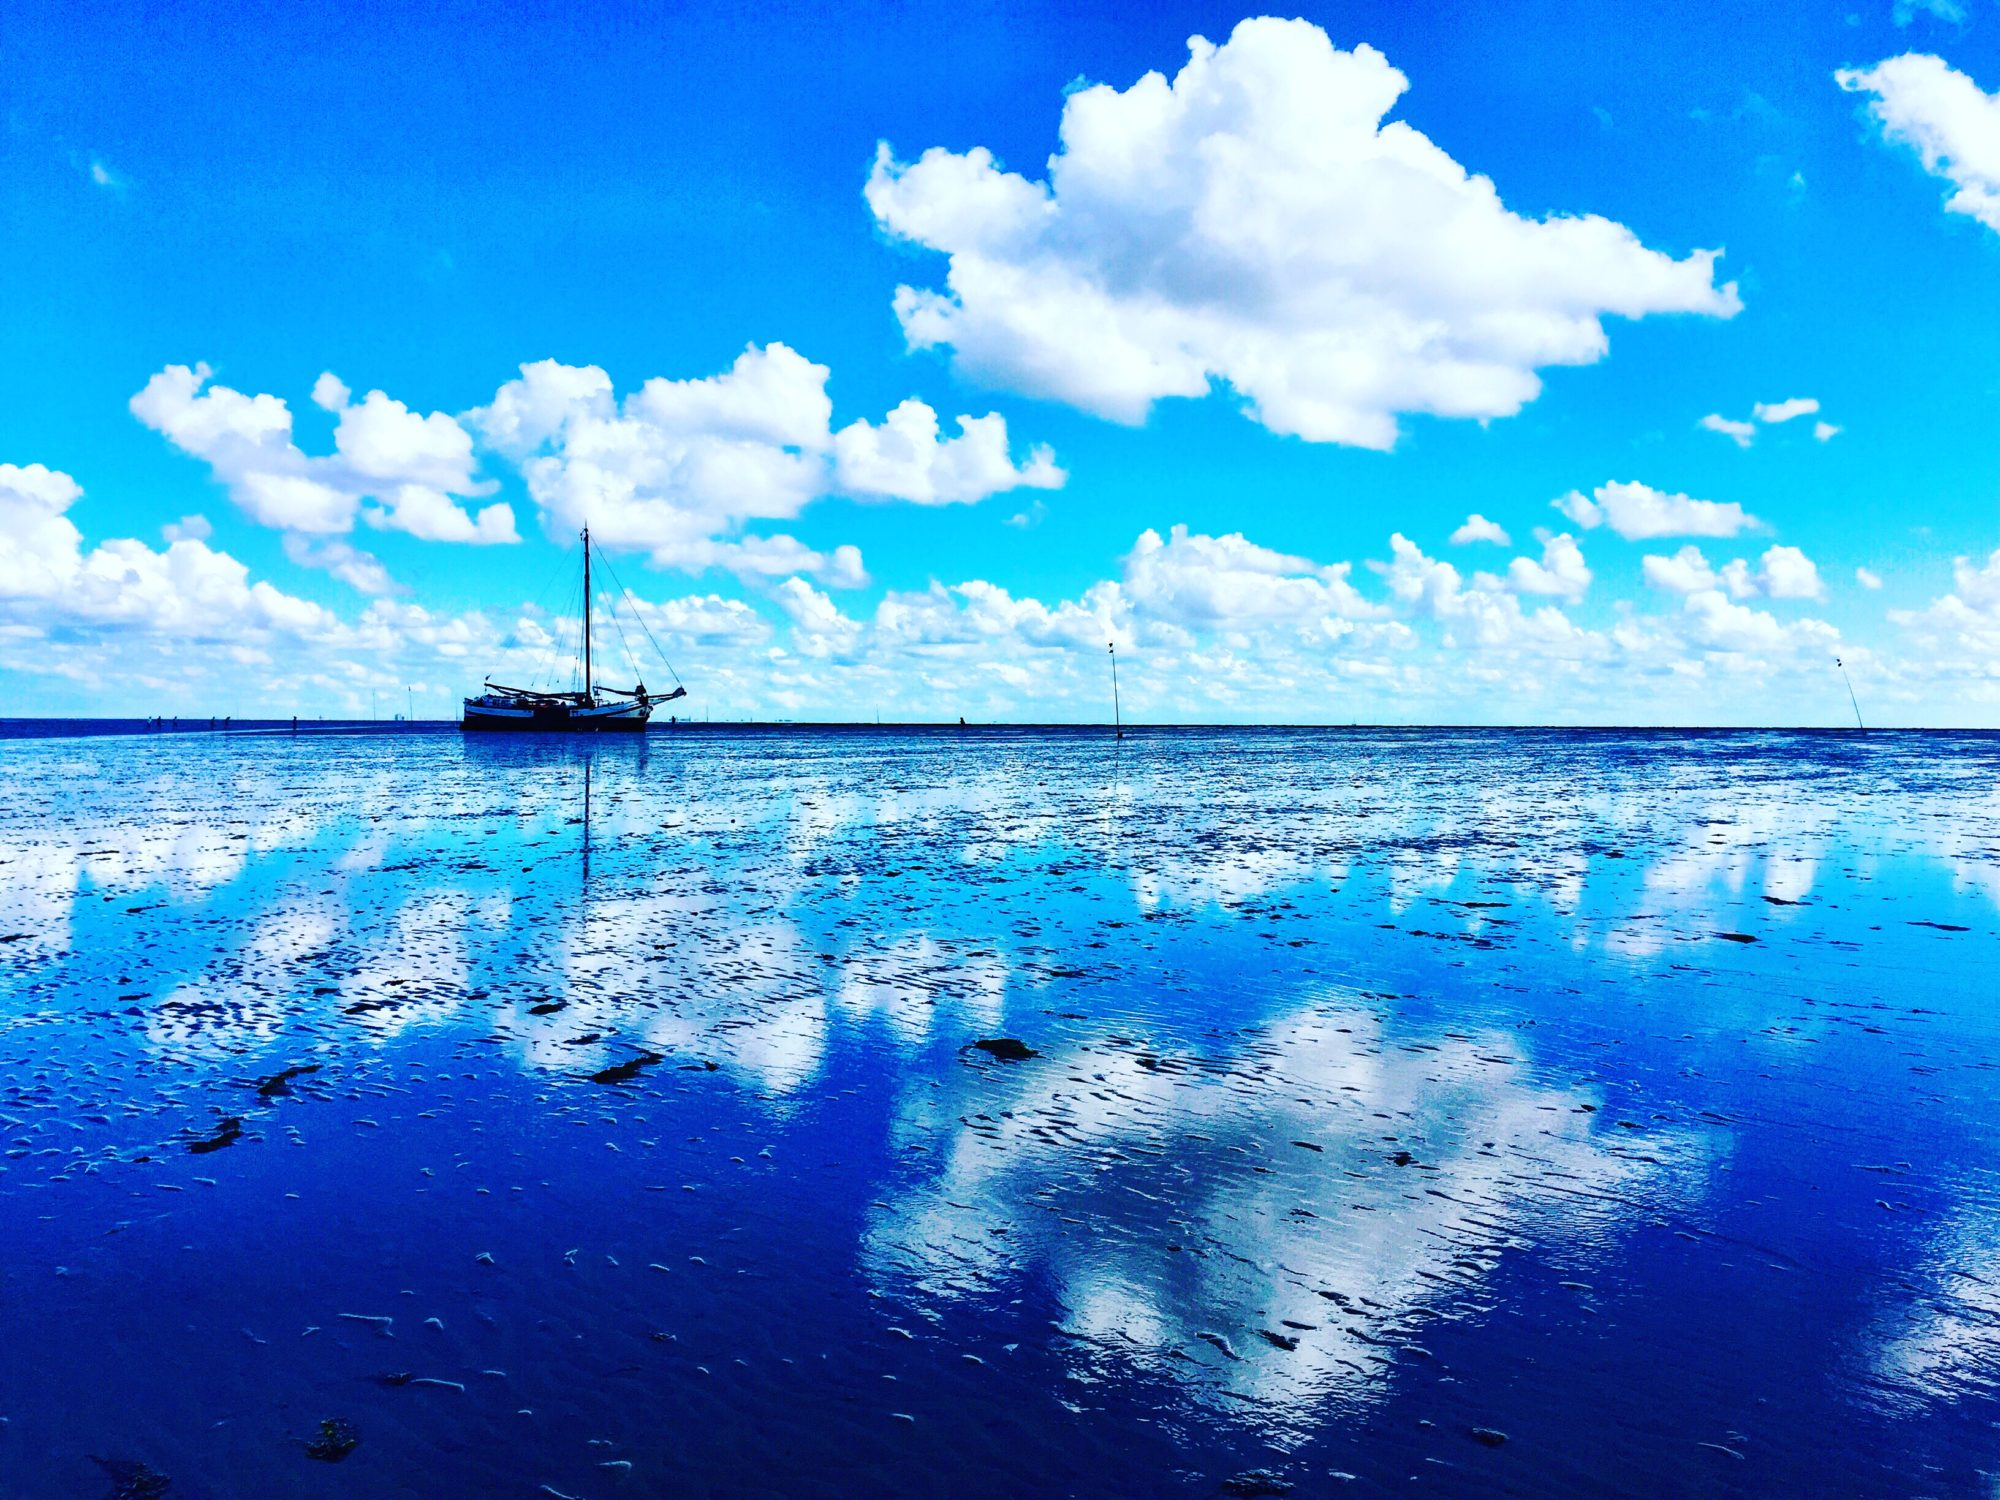 Droogvallen op de Waddenzee. Foto Sybylle Kroon